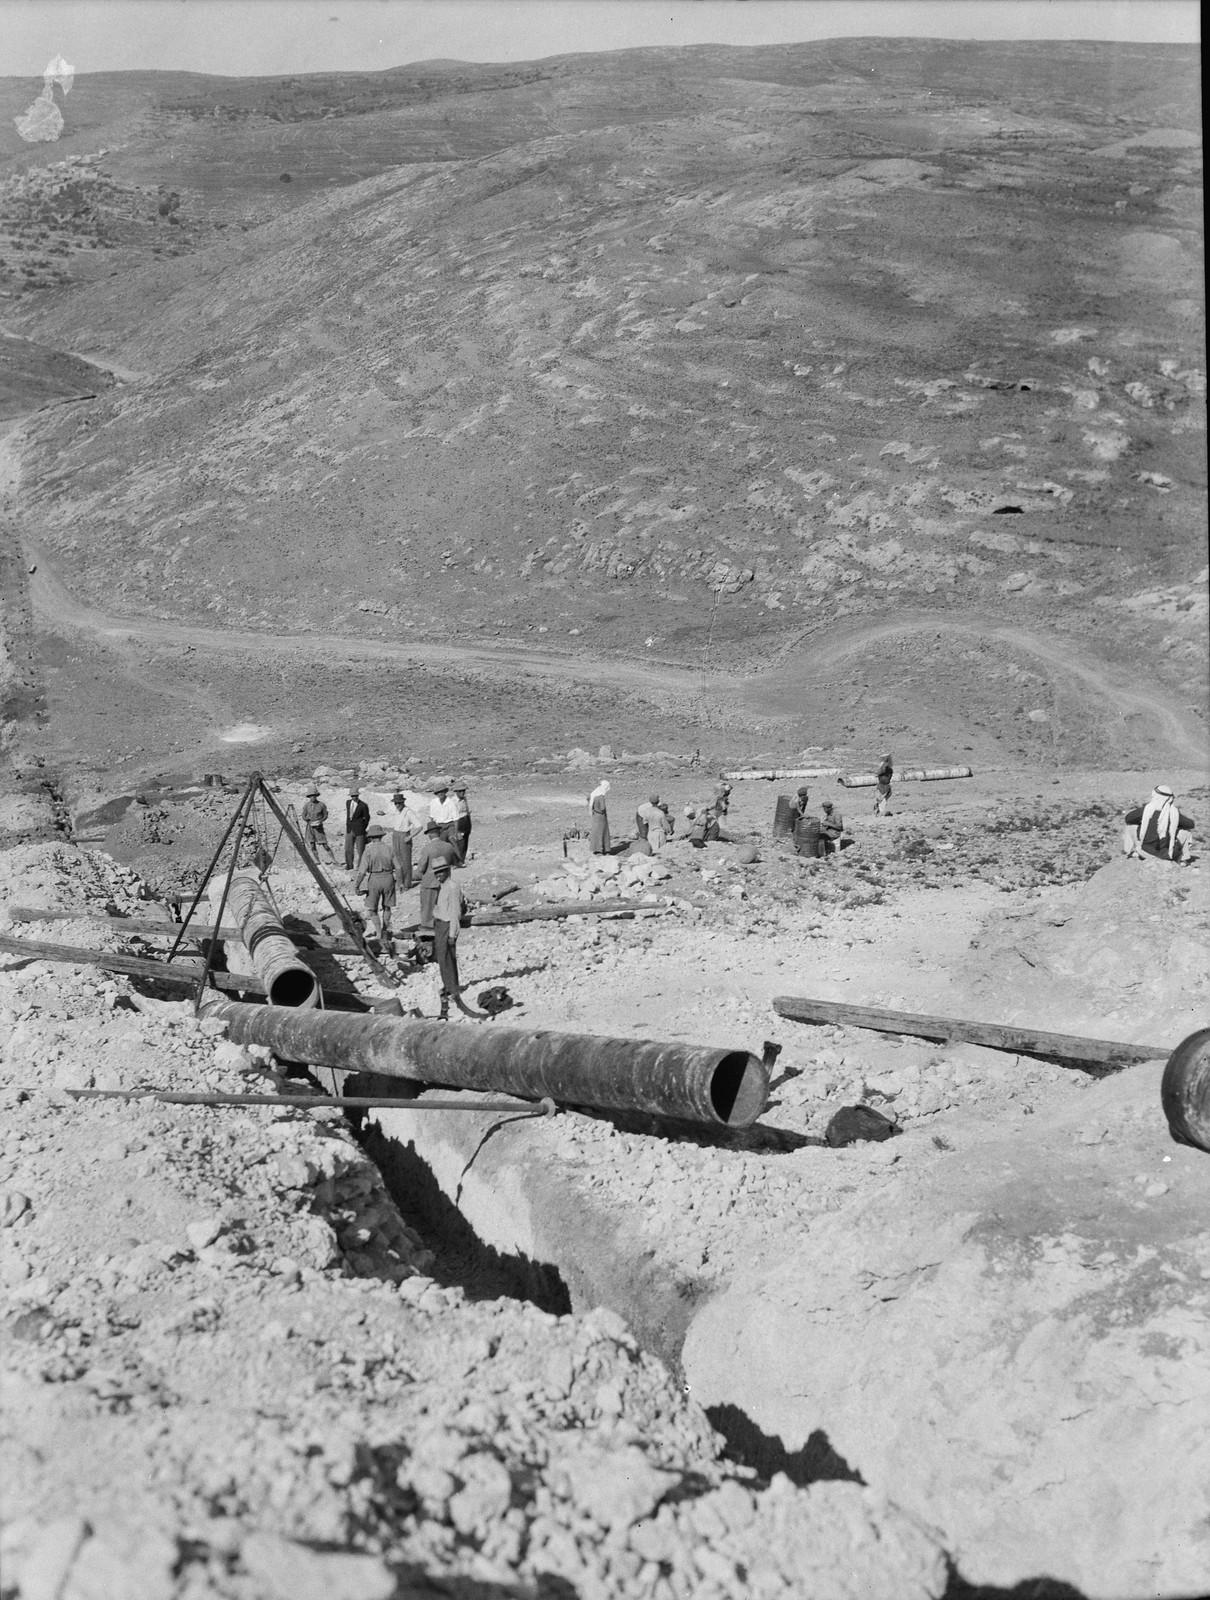 21. Трубопровод возле римской дороги возле Гиват Шауль